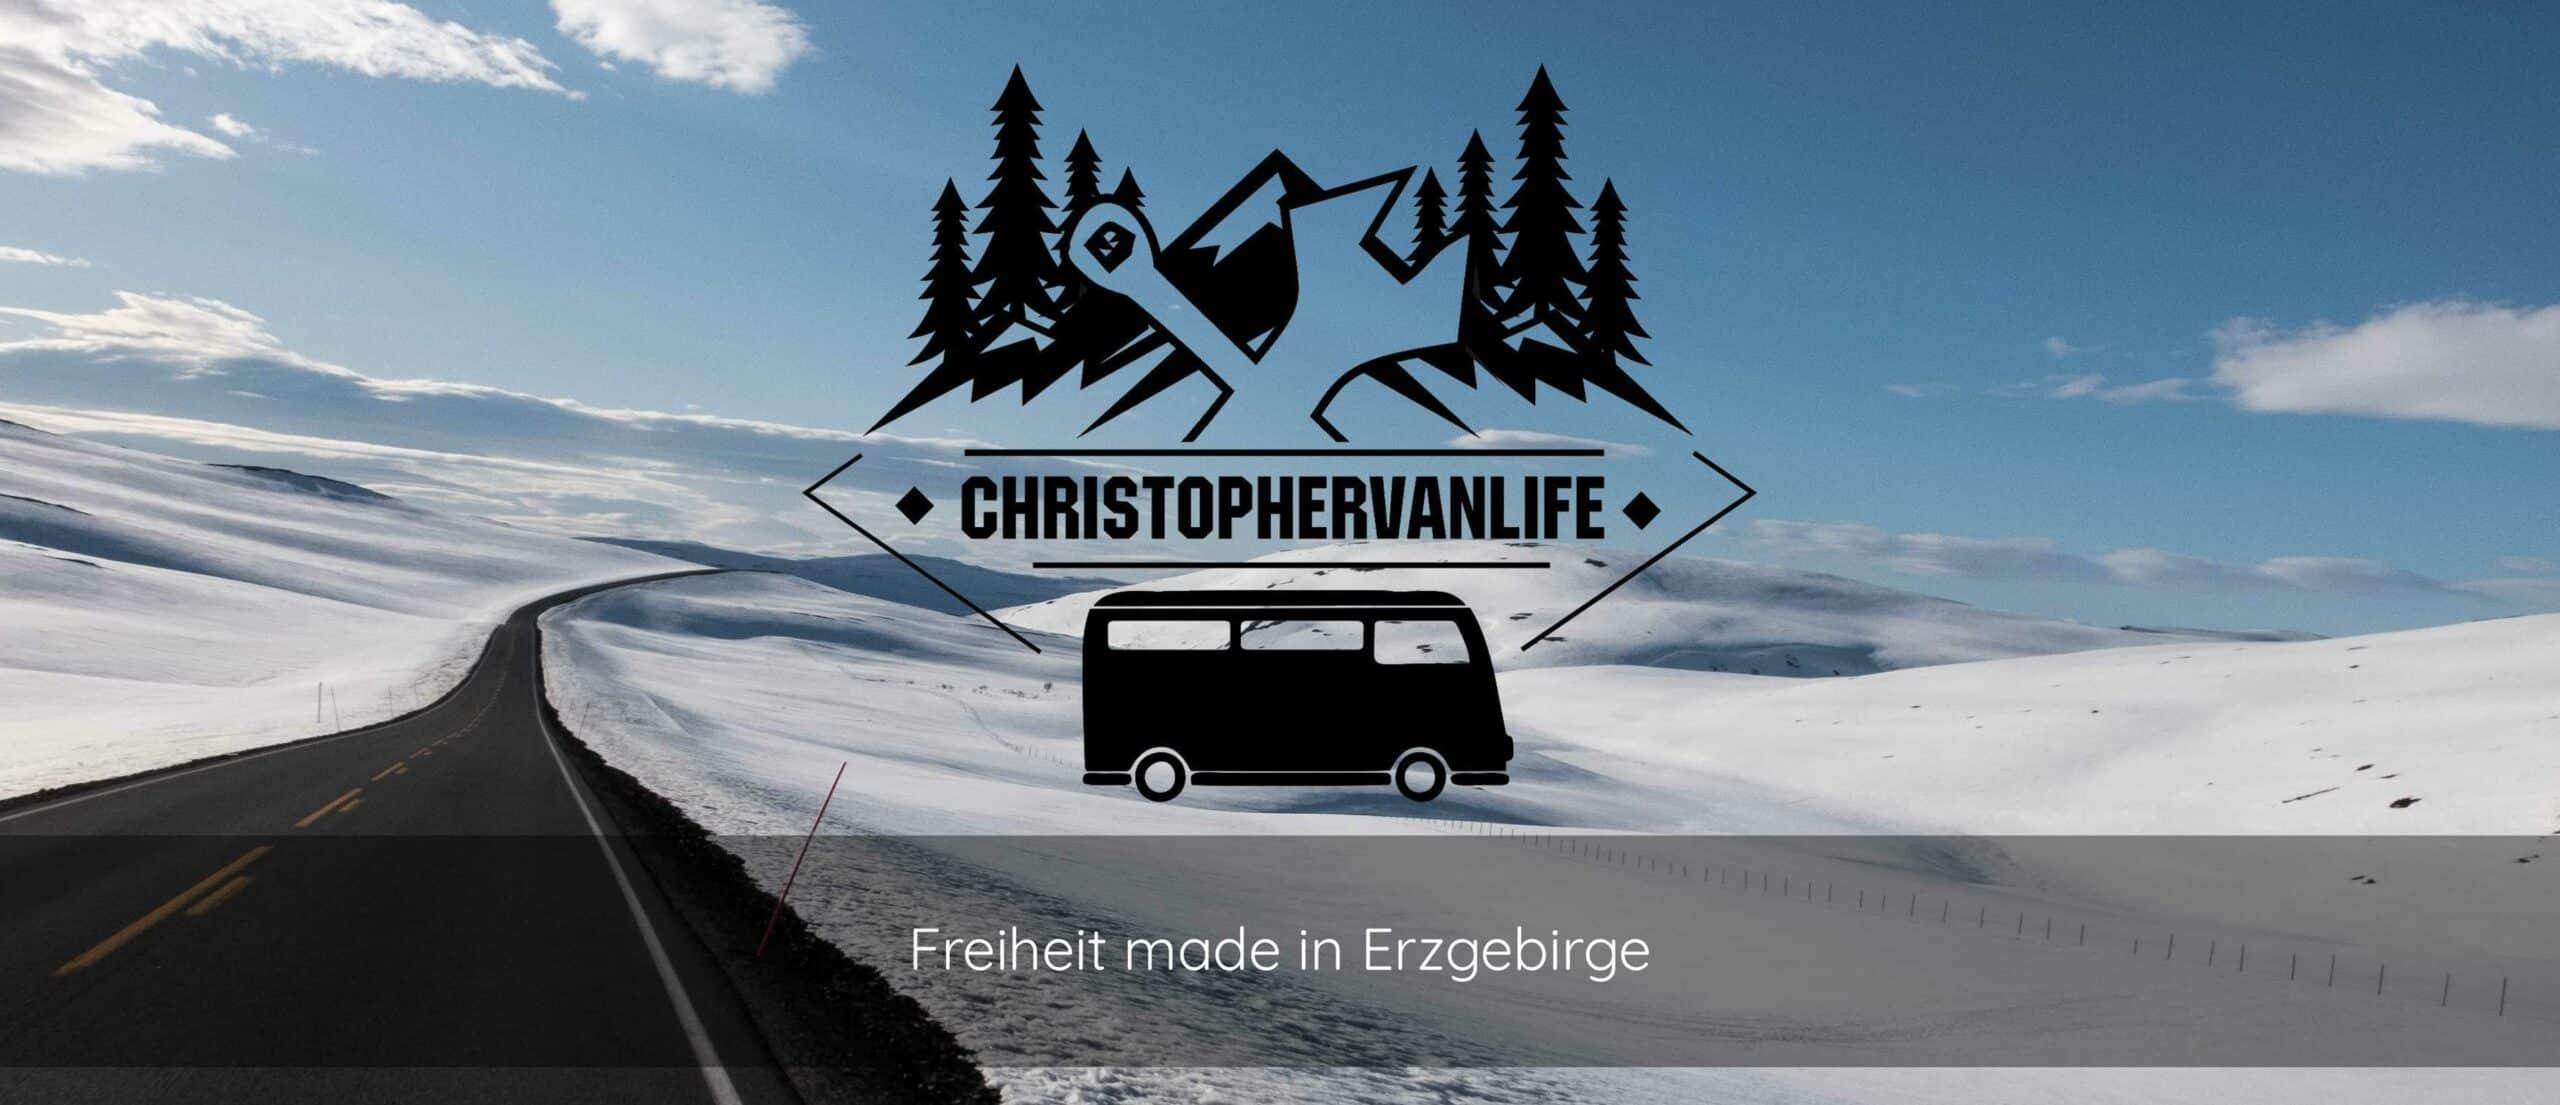 Christopher Vanlife Freiheit made in Erzgebirge